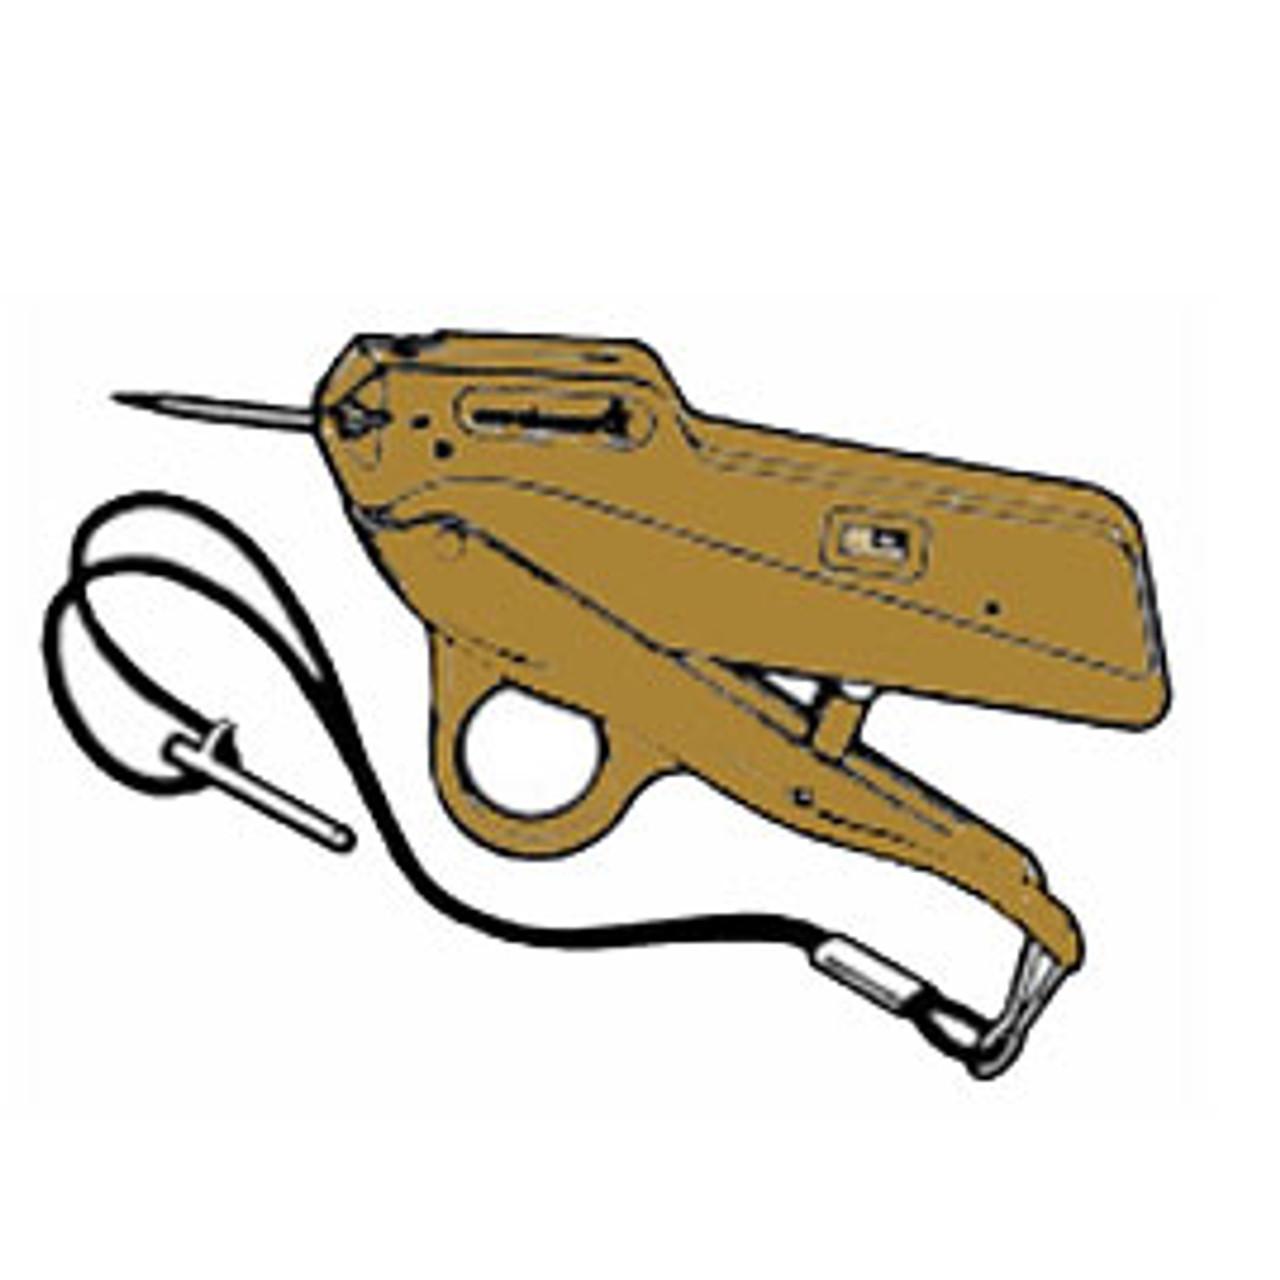 Reliable-Factory-Supply-Dennison-Mark-II-Swiftacher-Pistol-Grip